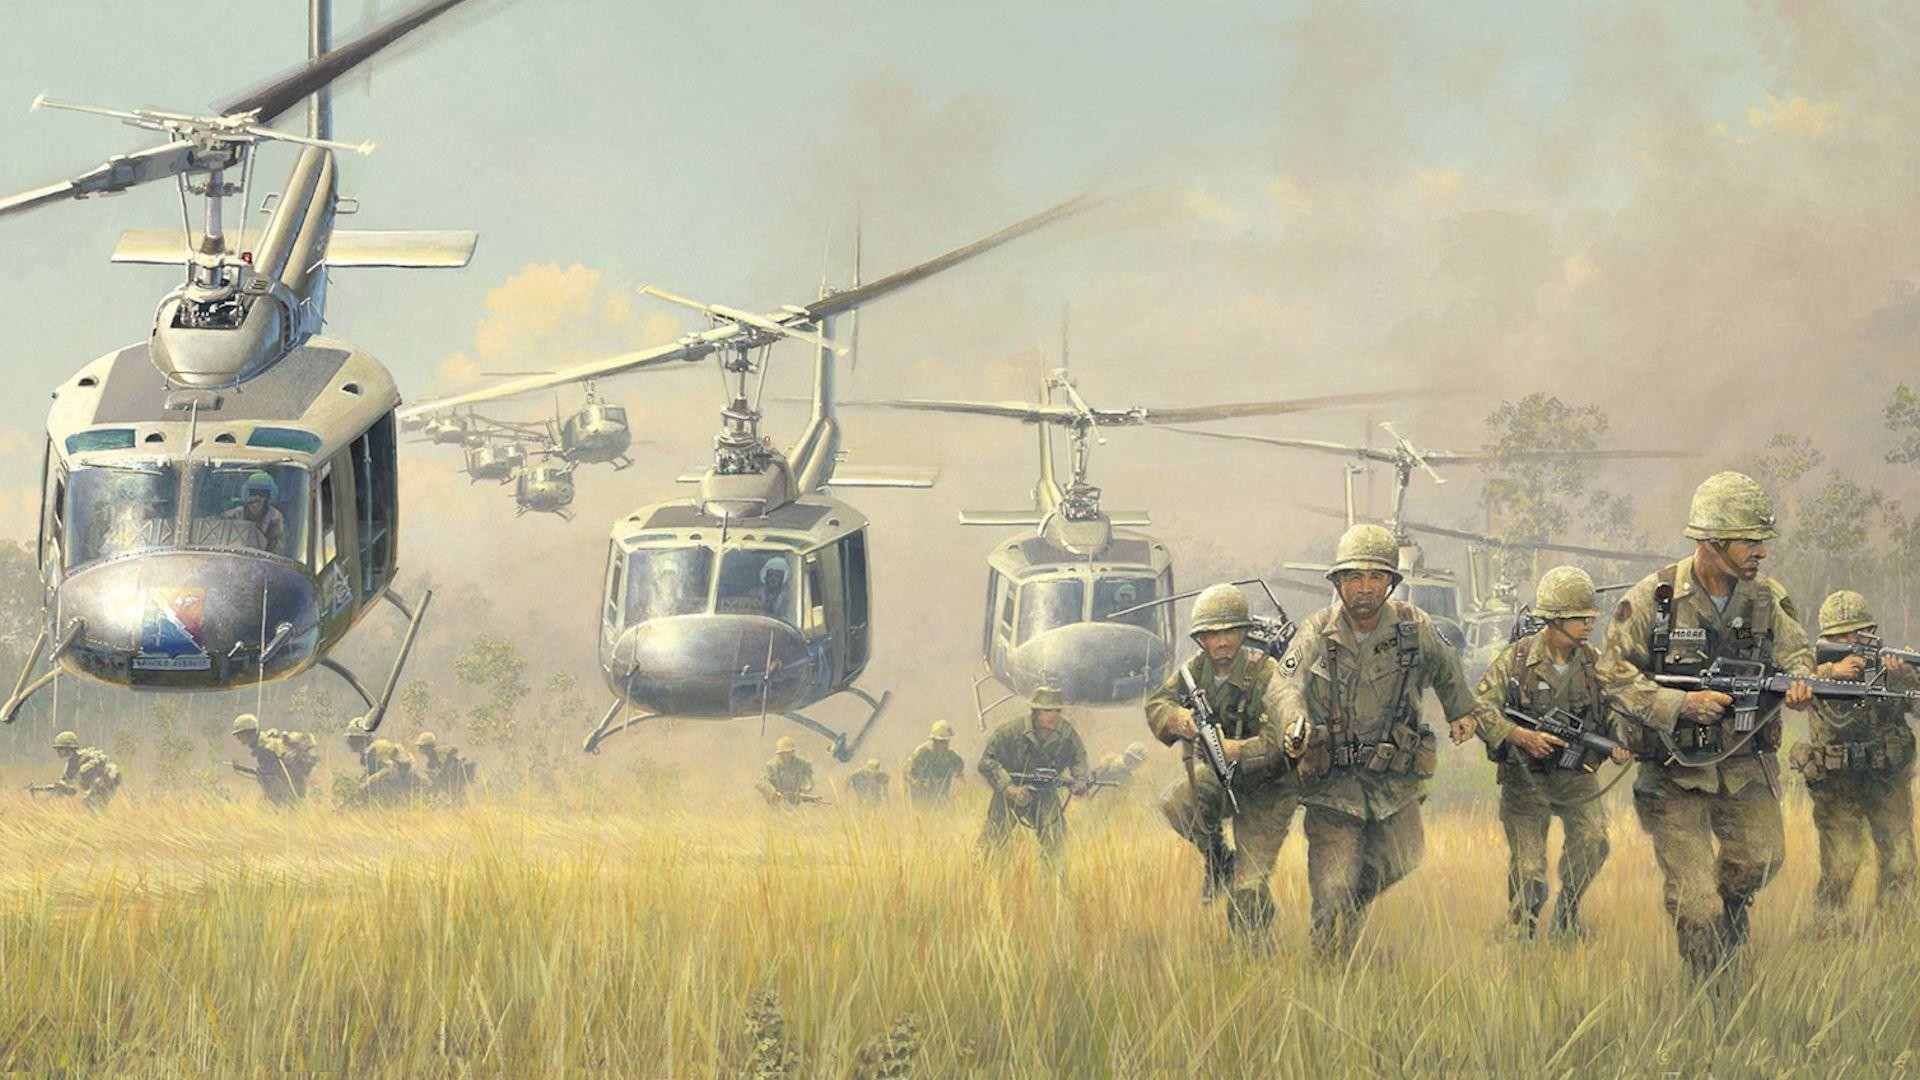 Vietnam War Wallpaper (50+ Images